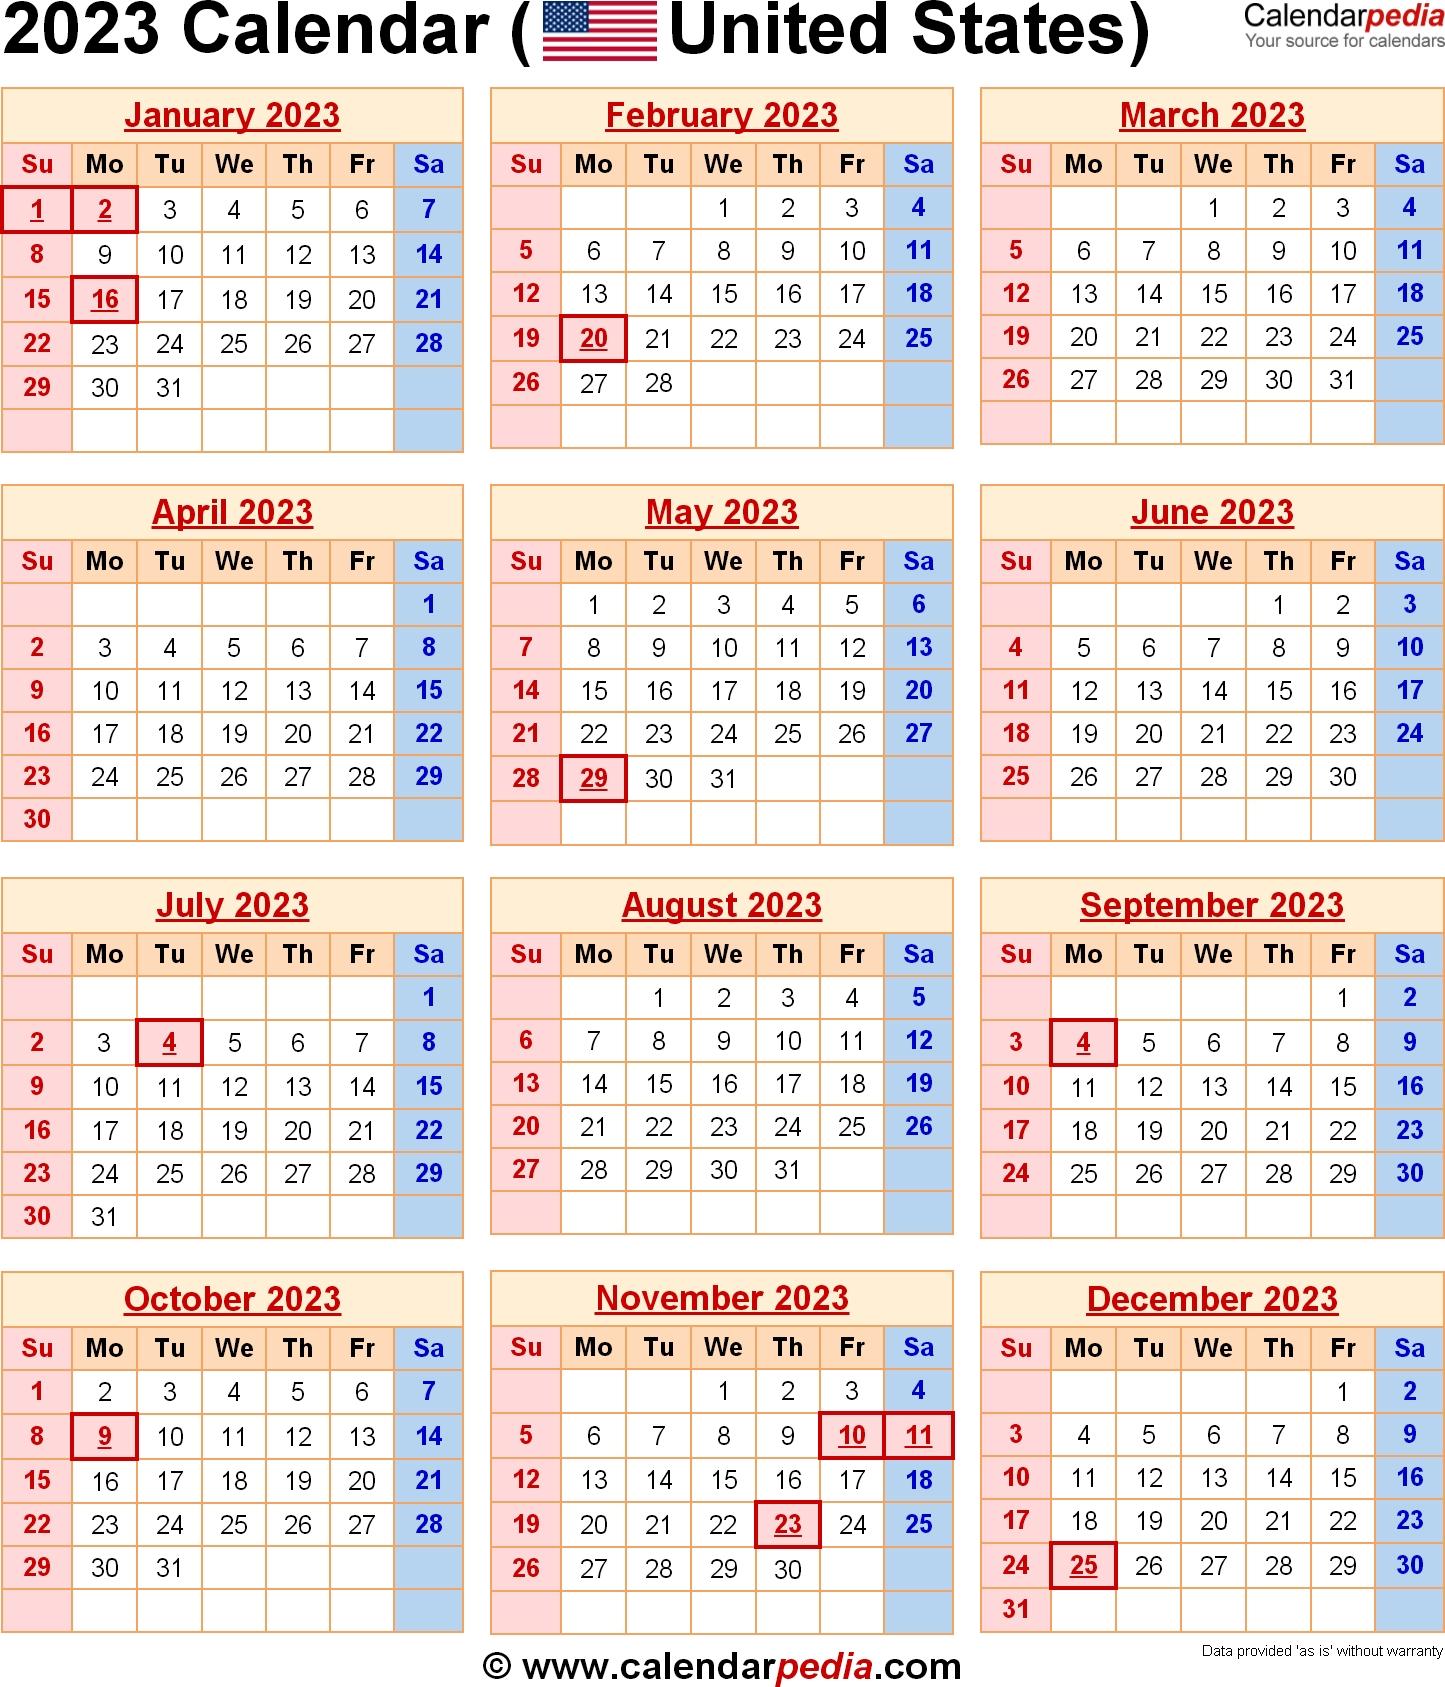 2023 Calendar With Federal Holidays